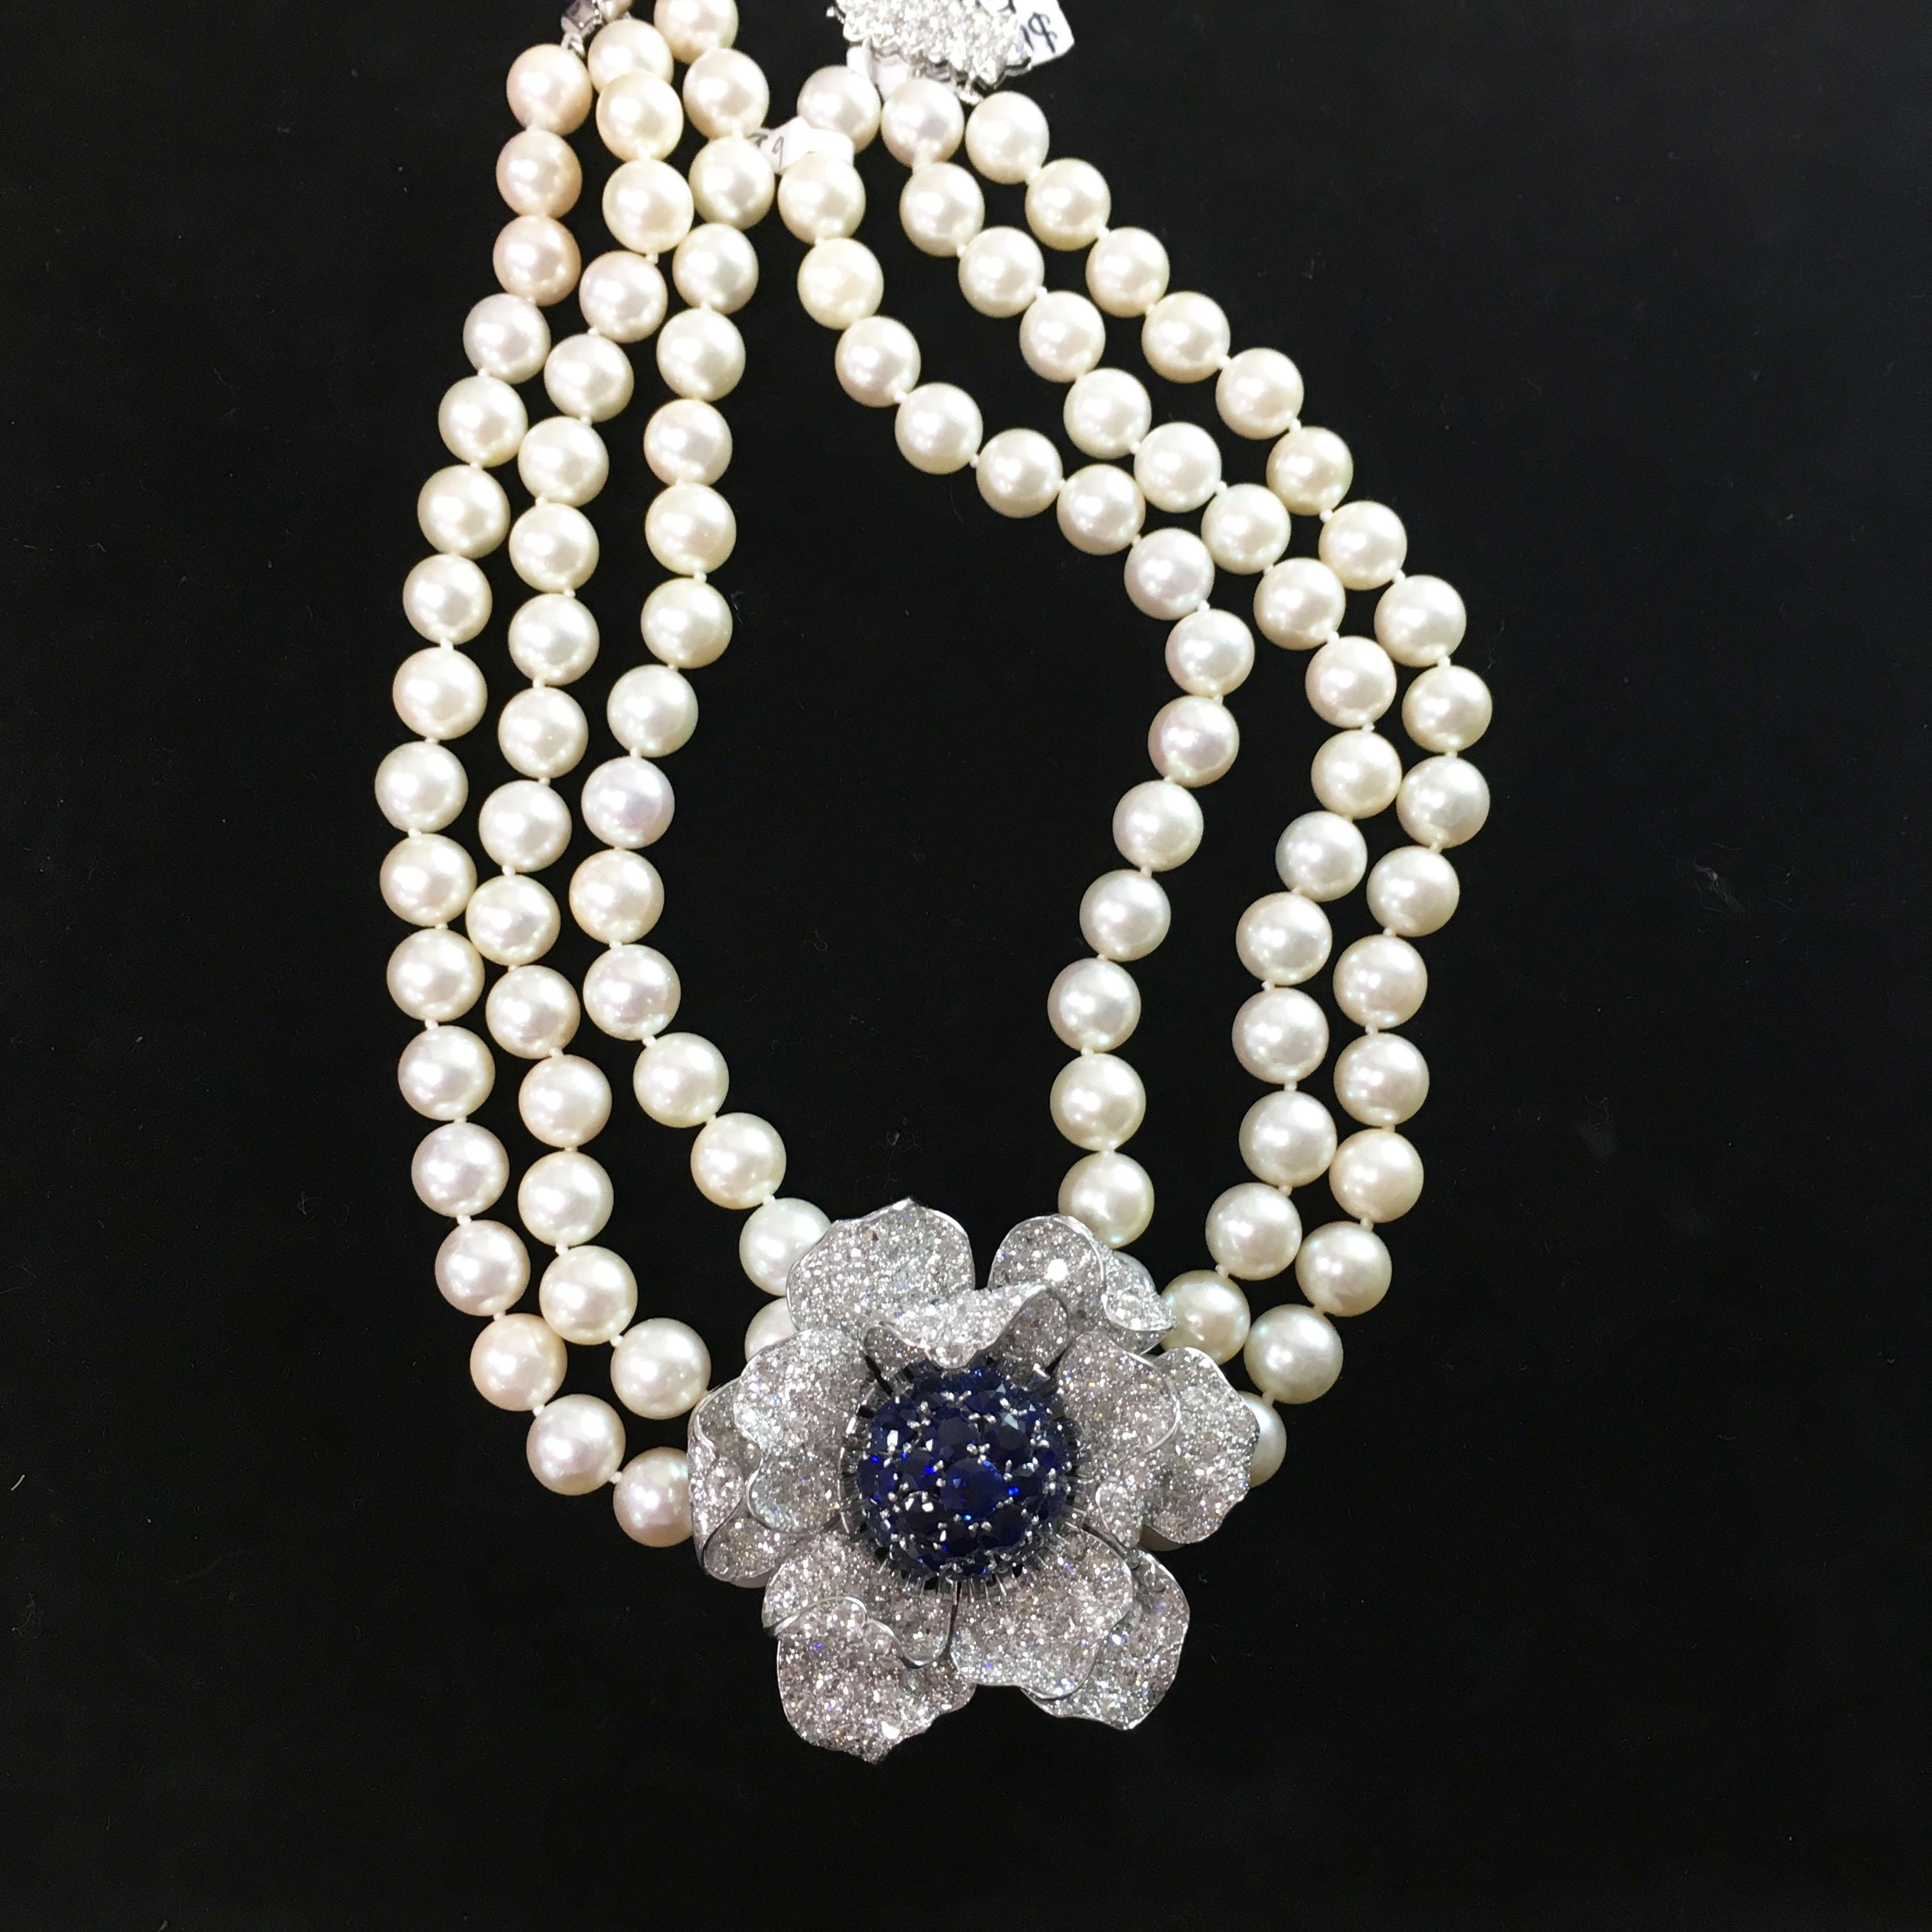 The Origin of Pearls